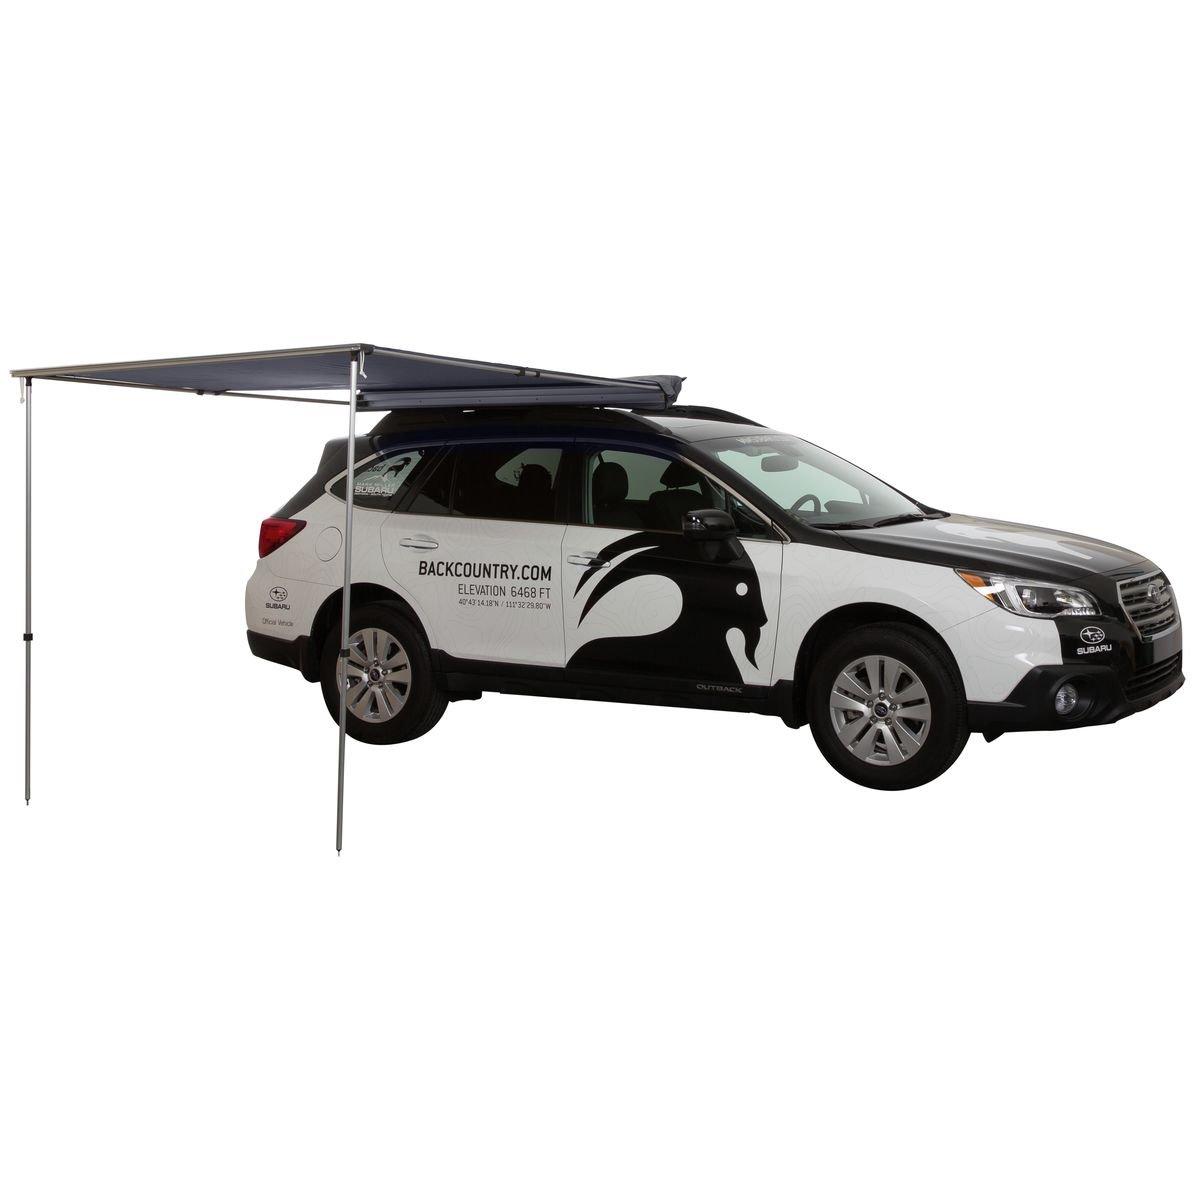 Tepuiオーニング窓 B06XXM9CDR 6ft|Gray Canopy/Black Cover Gray Canopy/Black Cover 6ft